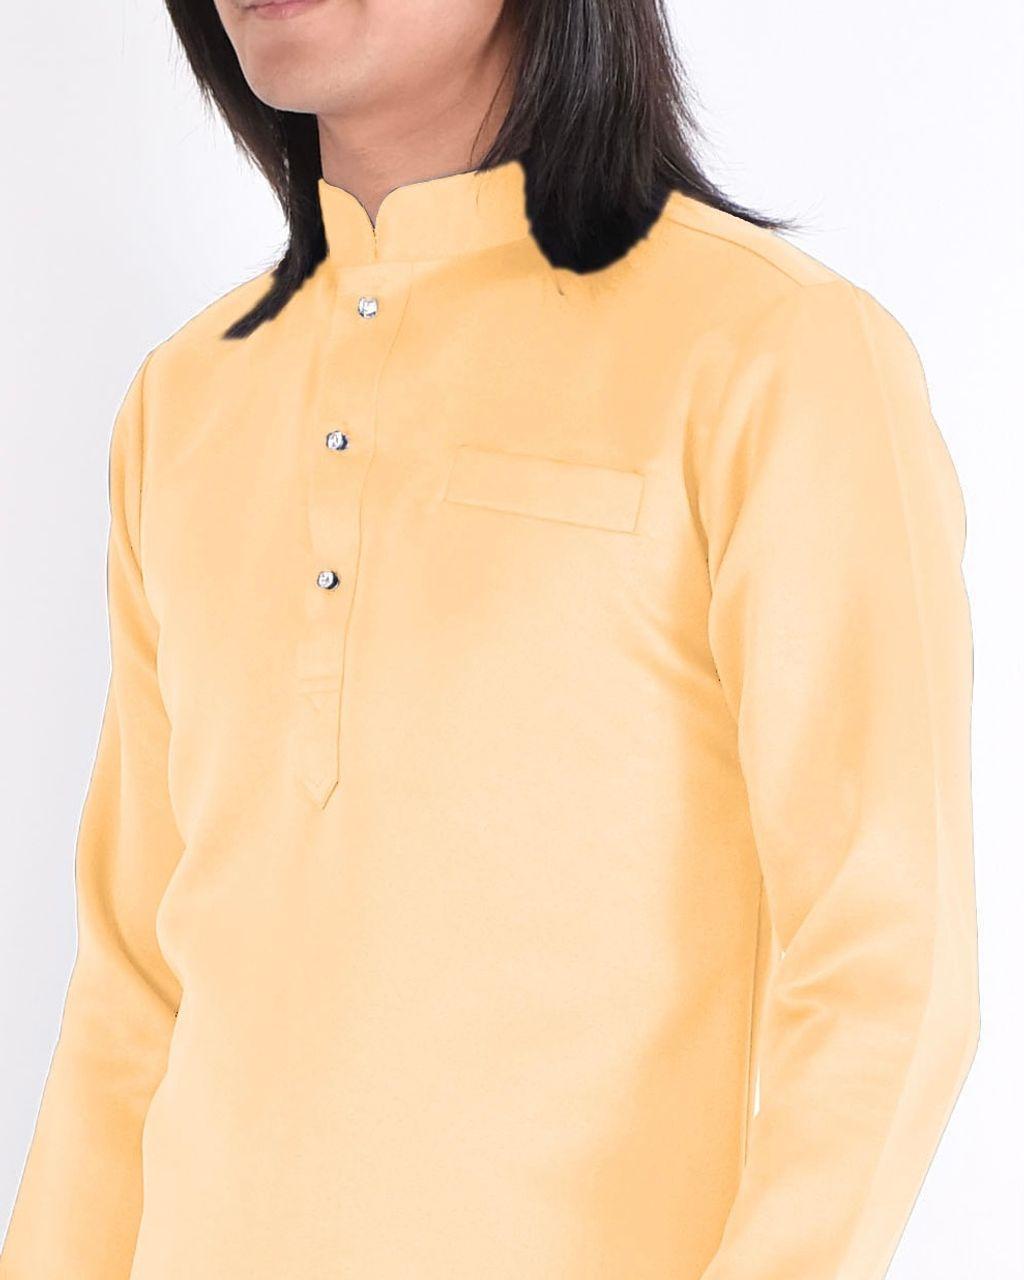 Soft Yellow 2.jpg